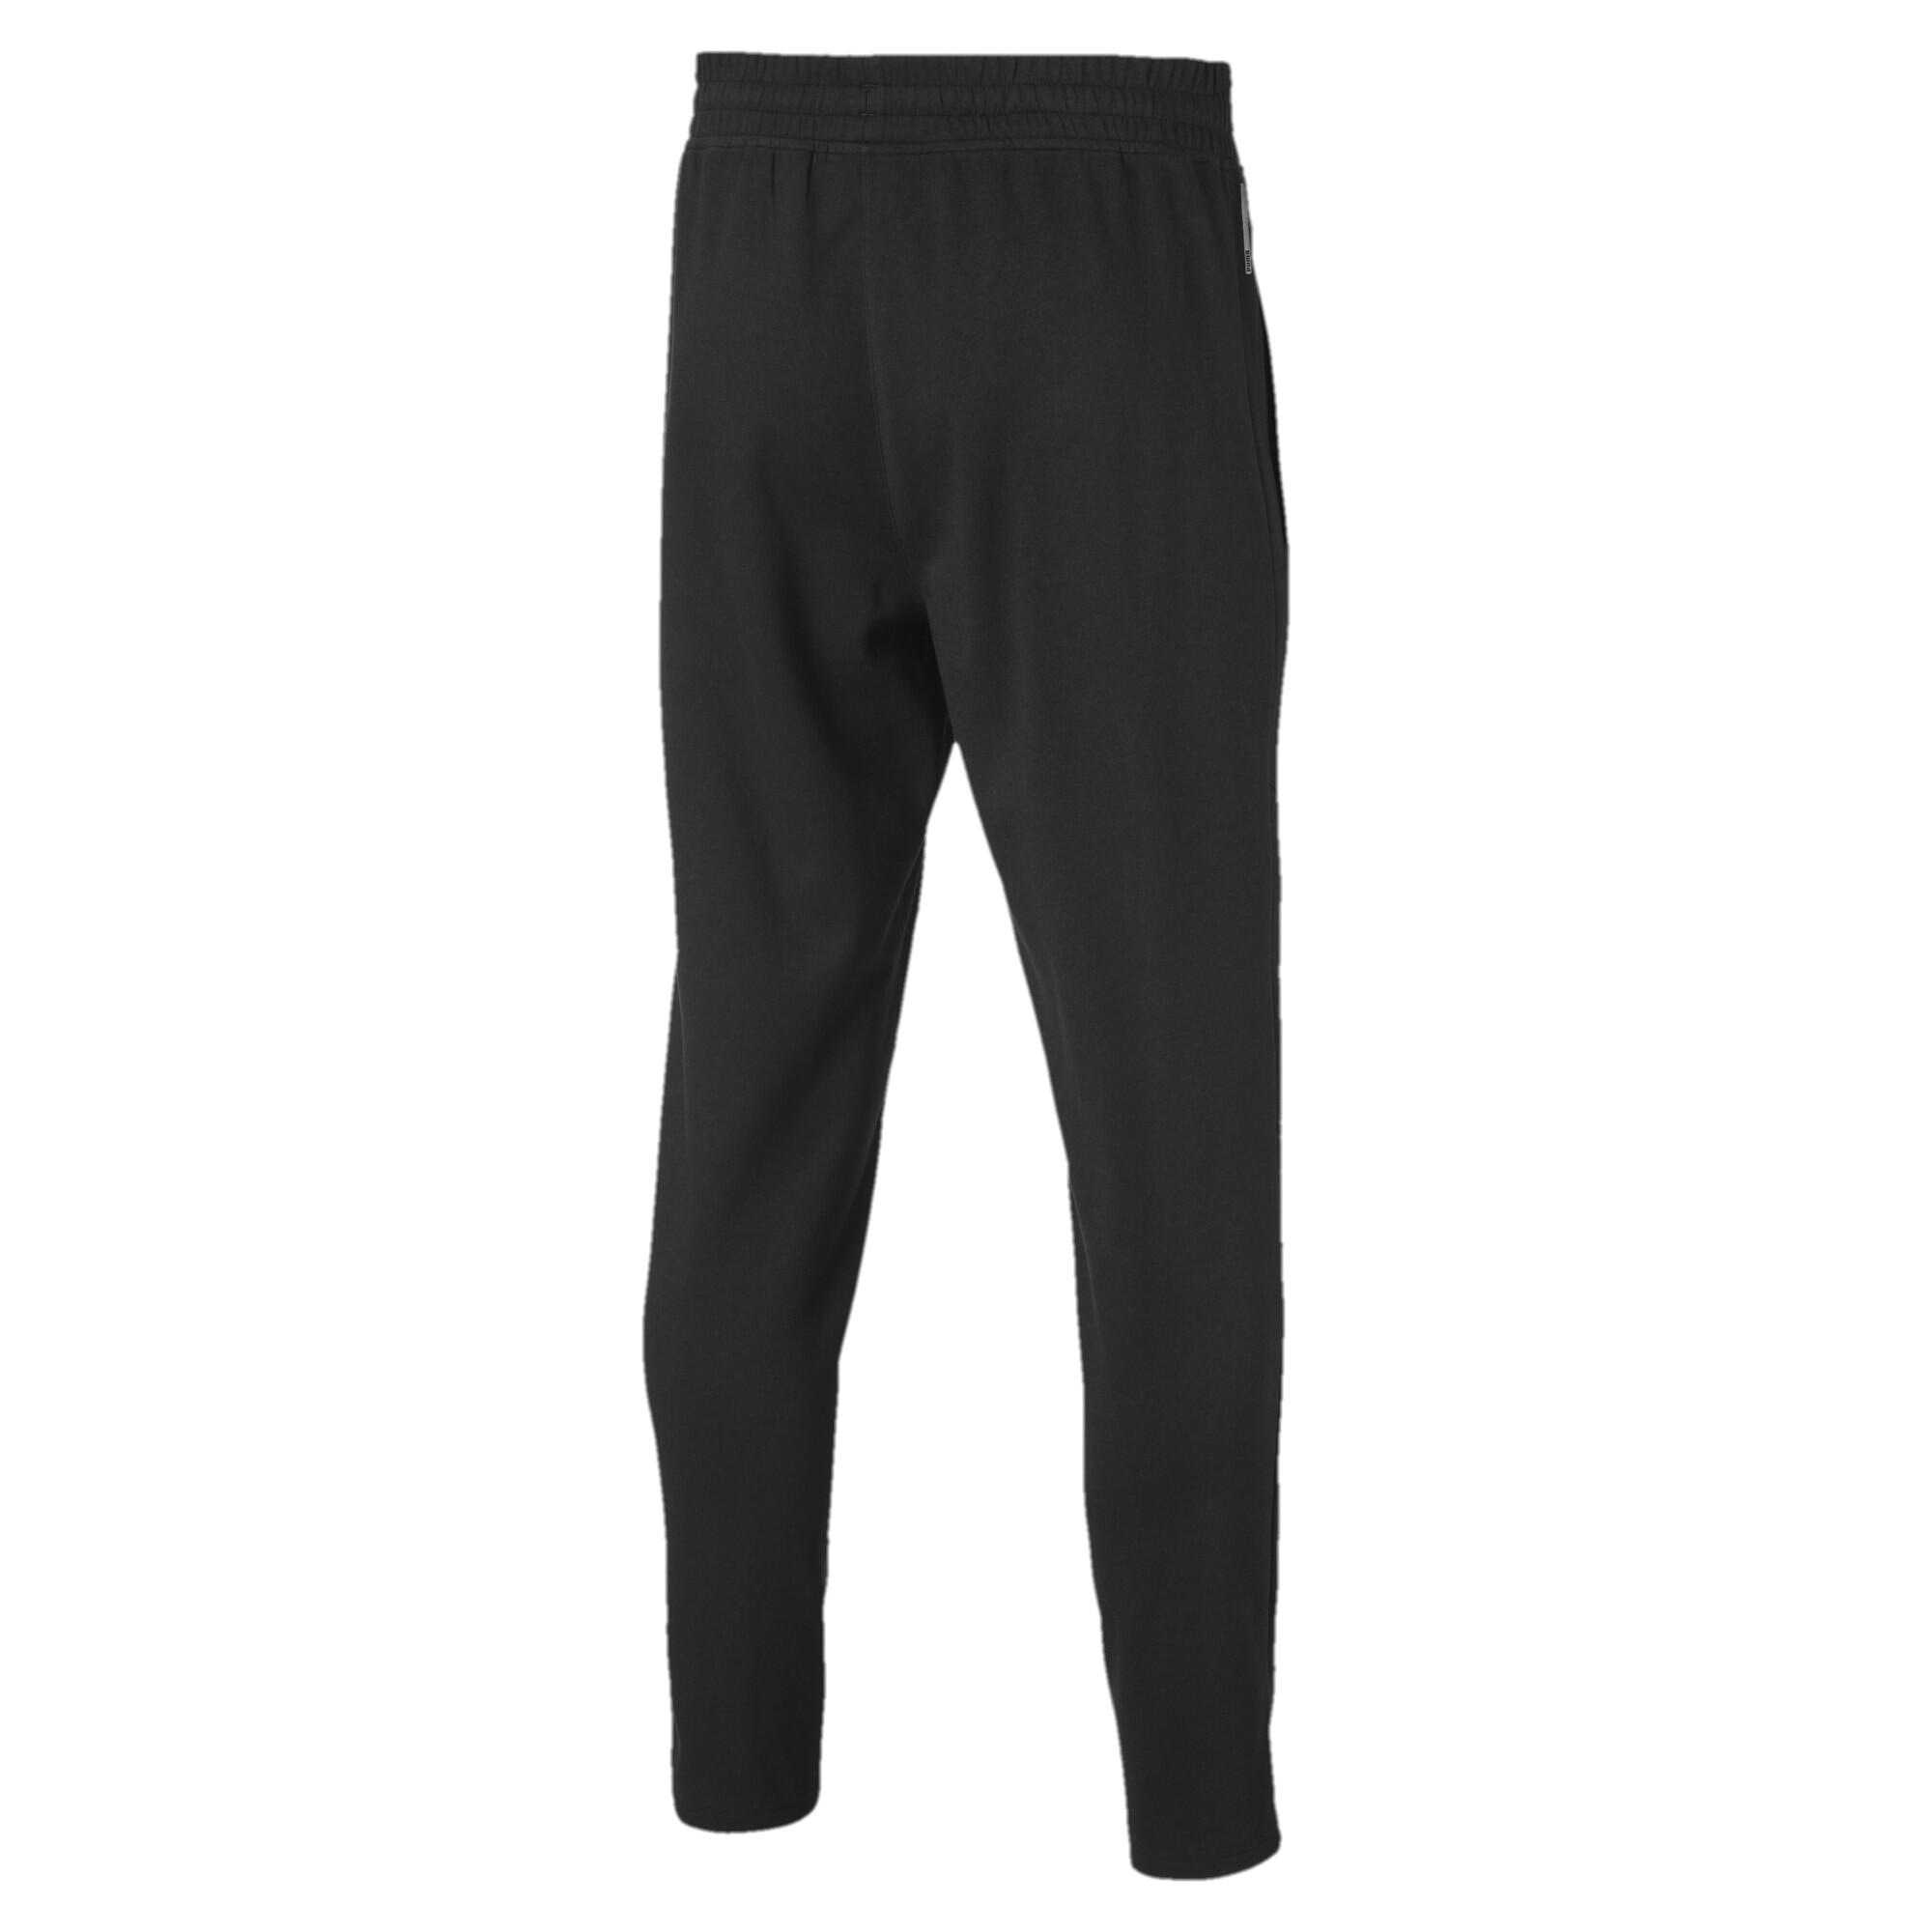 PUMA-Reactive-Trackster-Men-039-s-Training-Pants-Men-Knitted-Pants-Training thumbnail 3